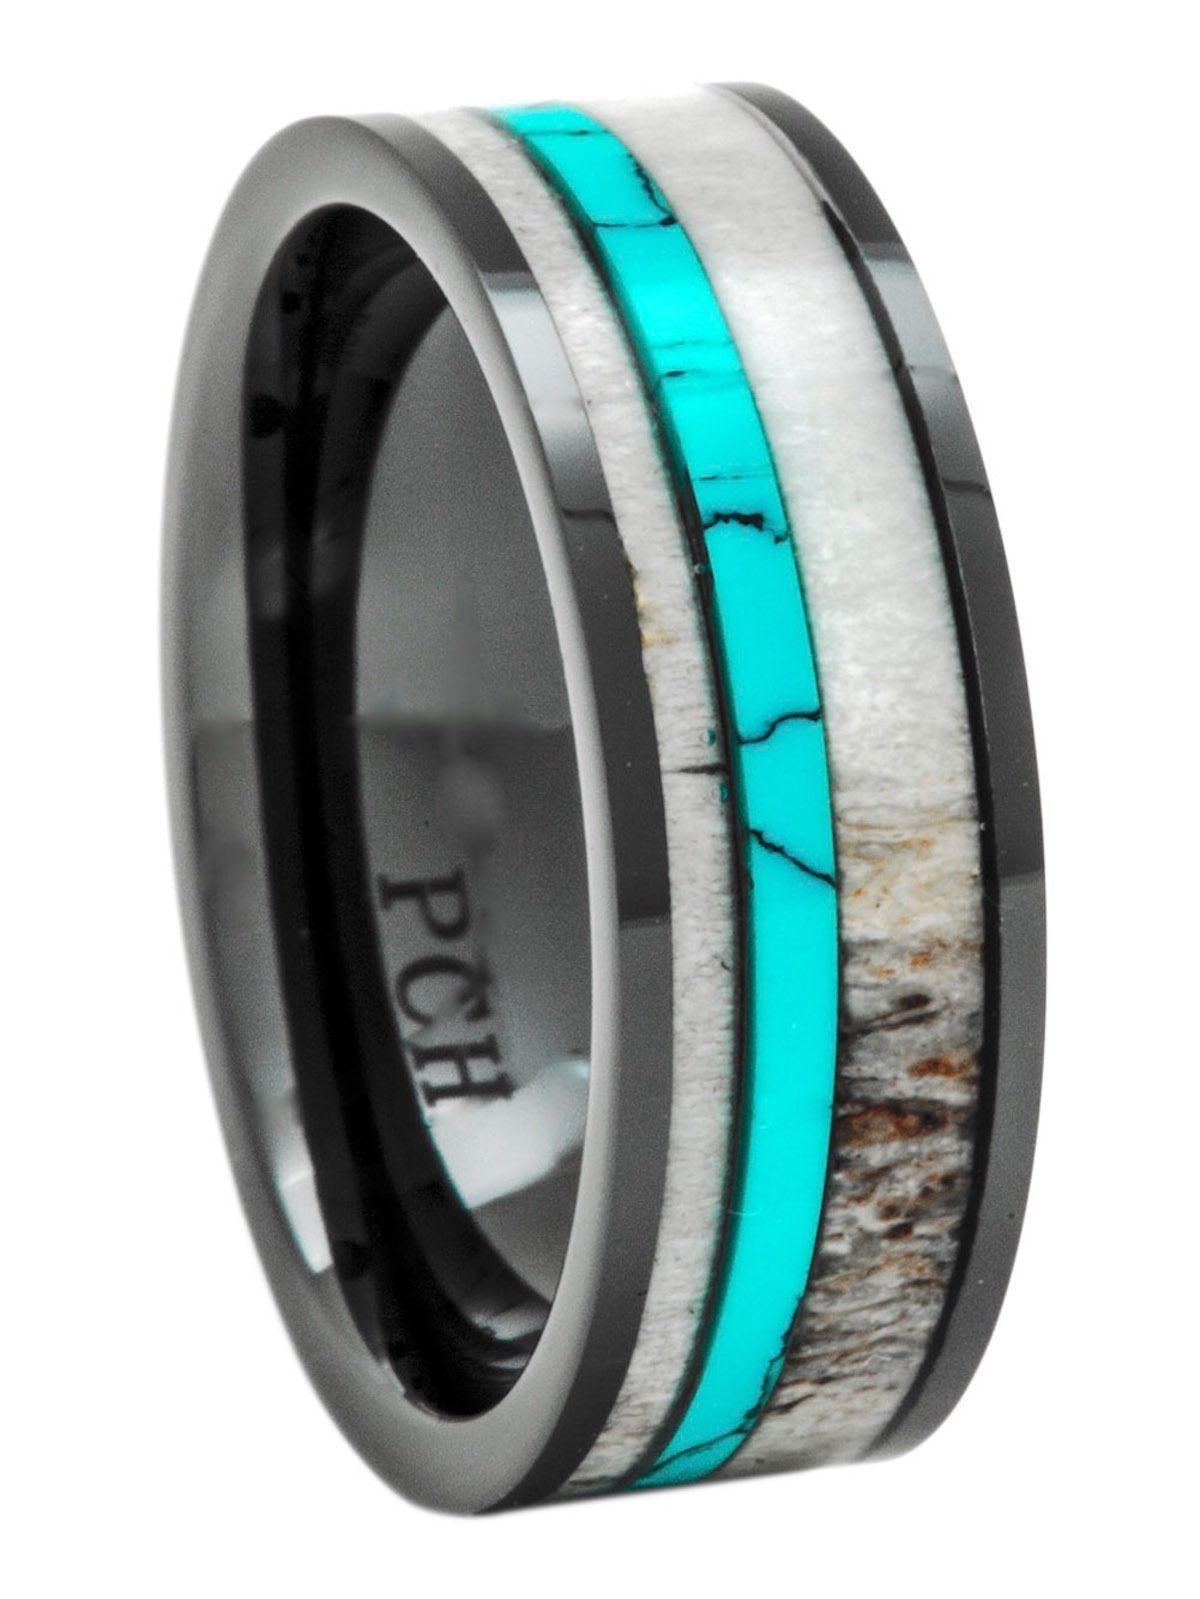 Deer Antler Ring Turquoise Black Ceramic 8mm Fort Fit Wedding Band Or Gift: Antler Wedding Ring Turquoise At Websimilar.org